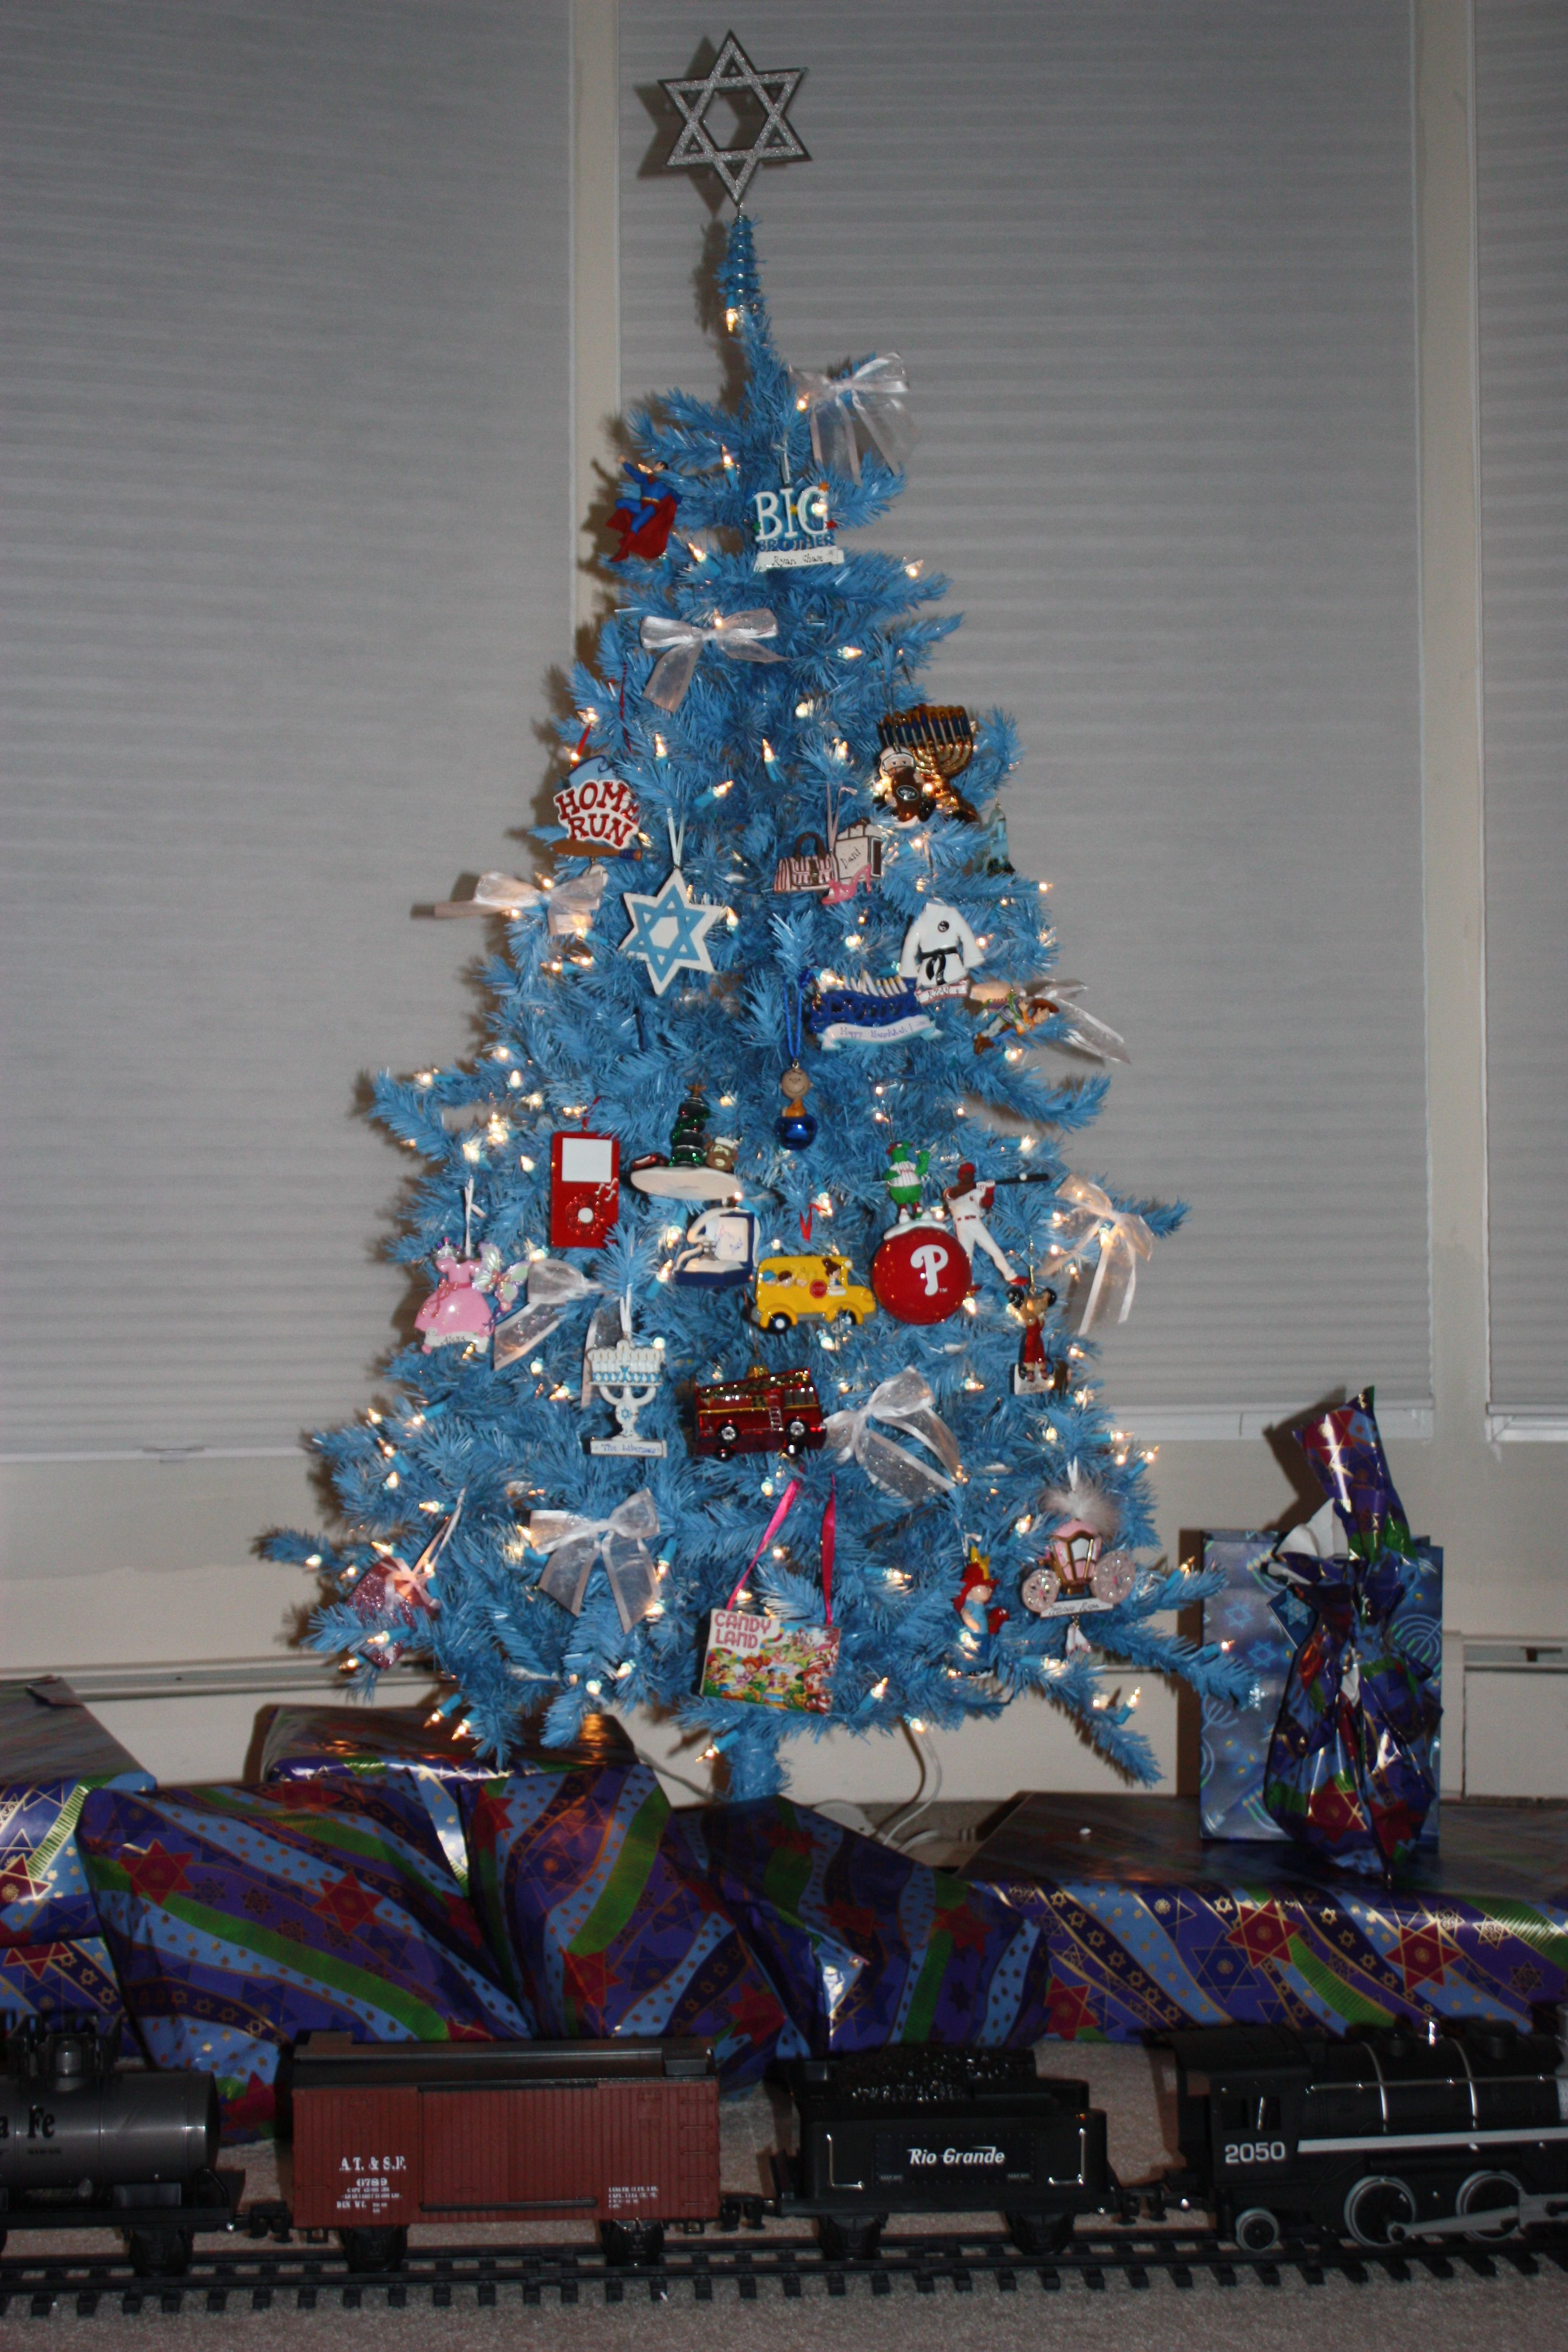 Hanukkah Bush or Jewish-themed Christmas tree? Either way, this ...